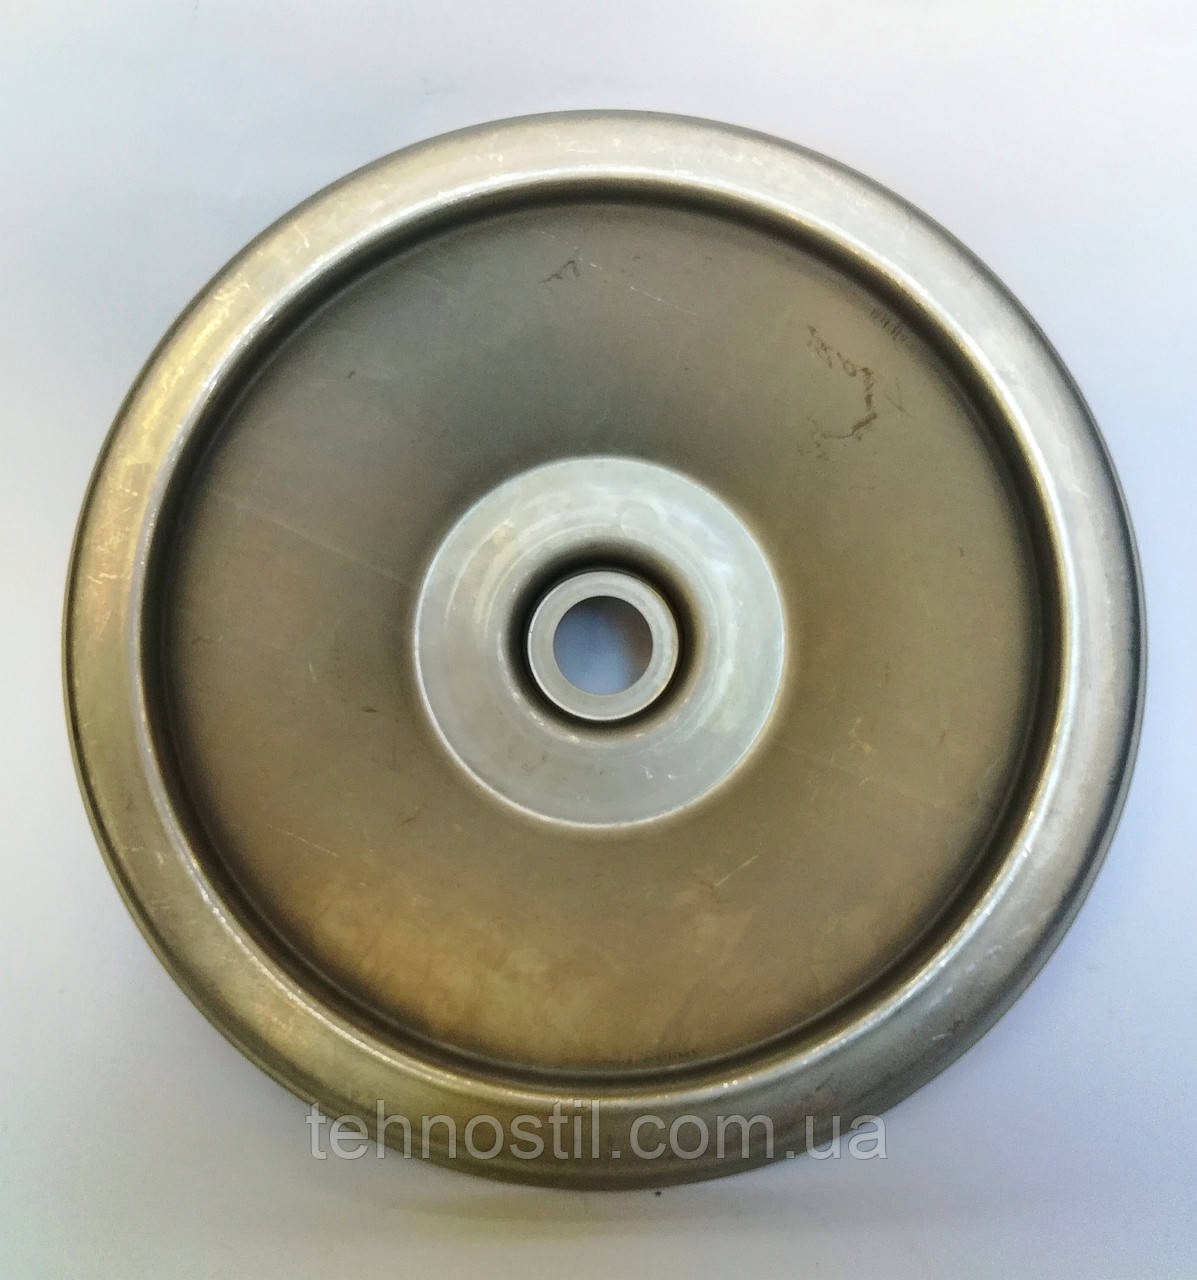 Крышка корпуса насоса (тарелка) Pedrollo JCR/JSW 10-15